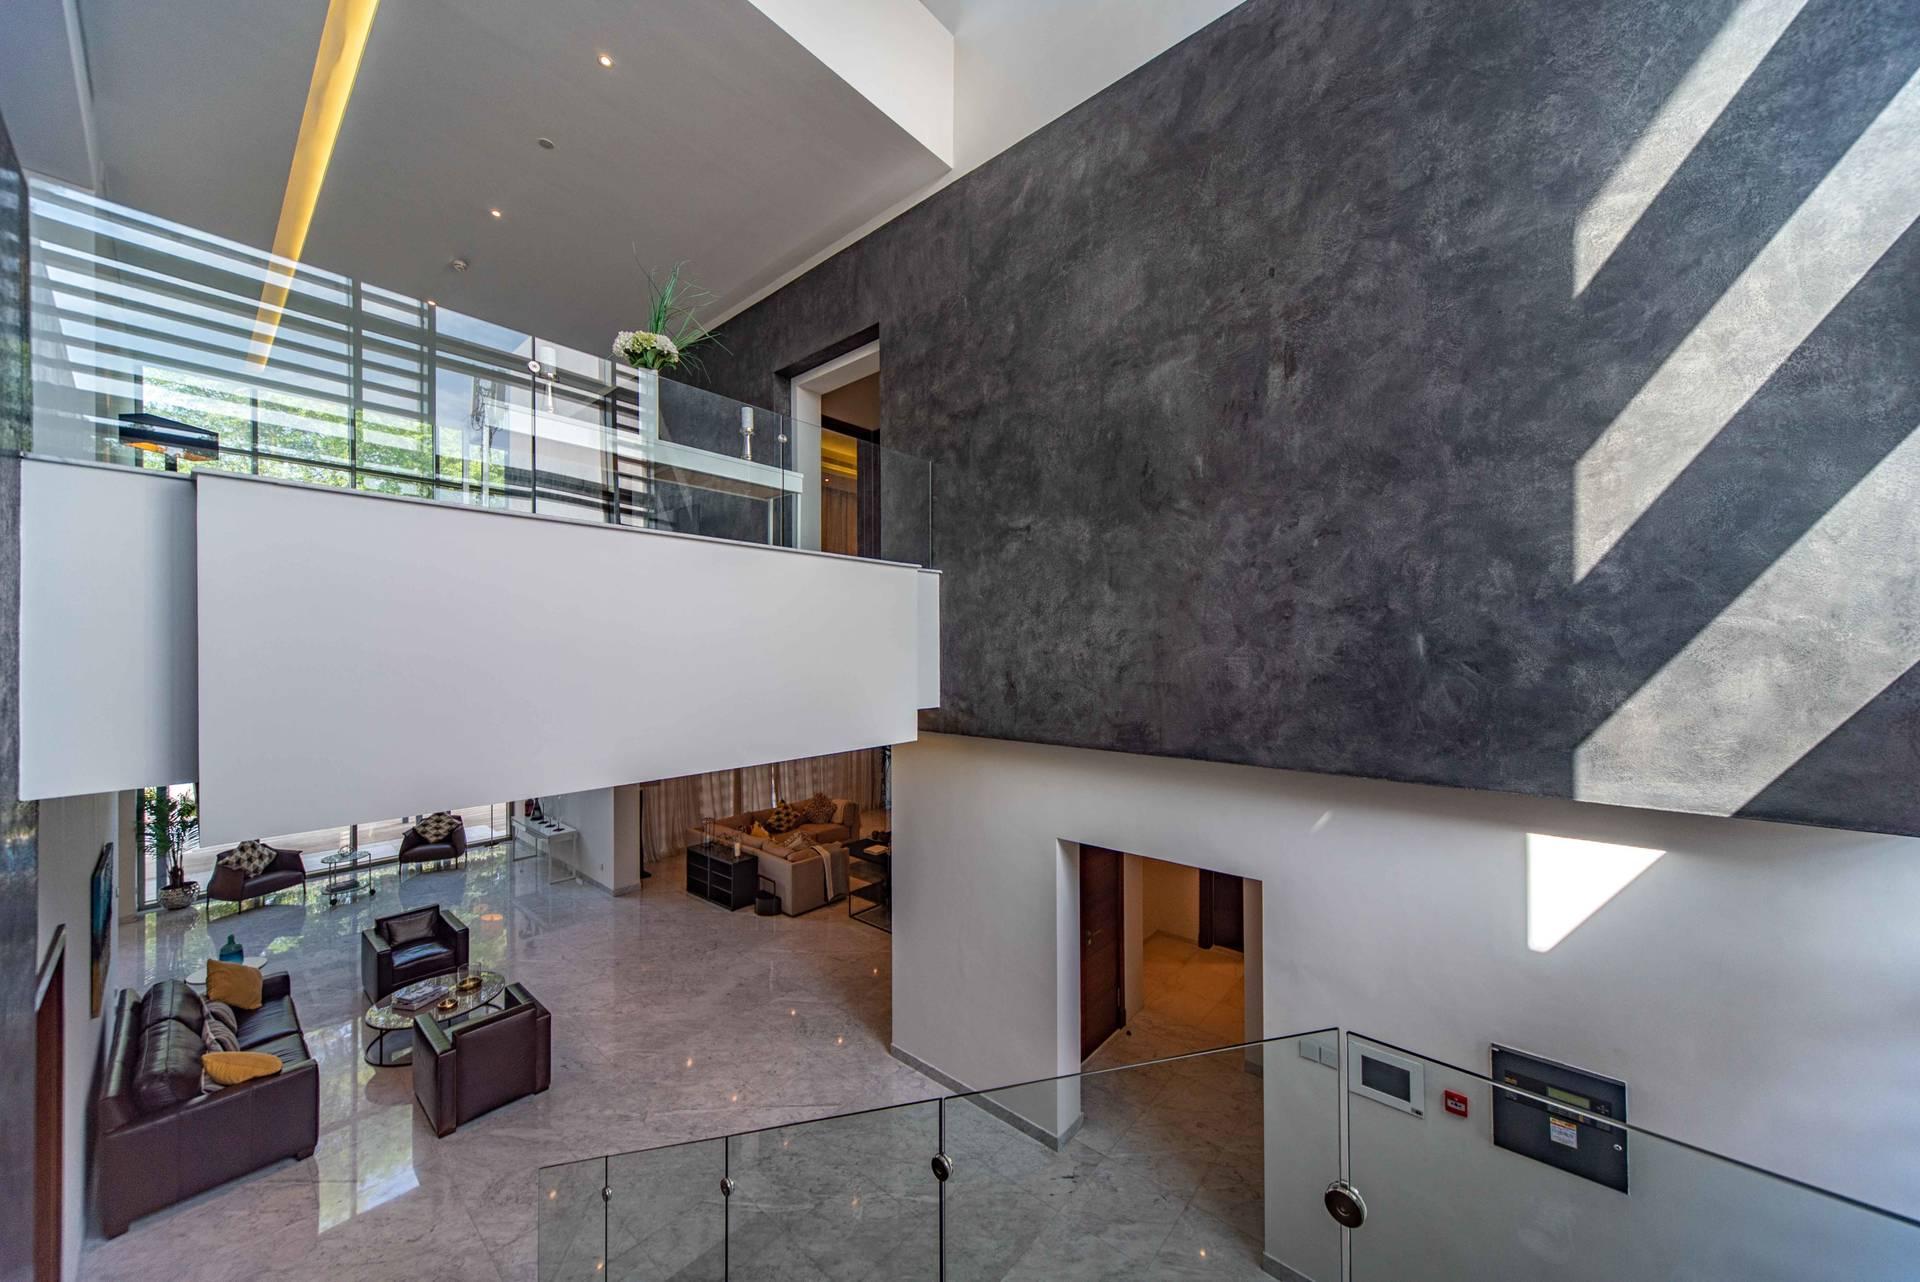 SALE in District One Villas-Dubai-UAE